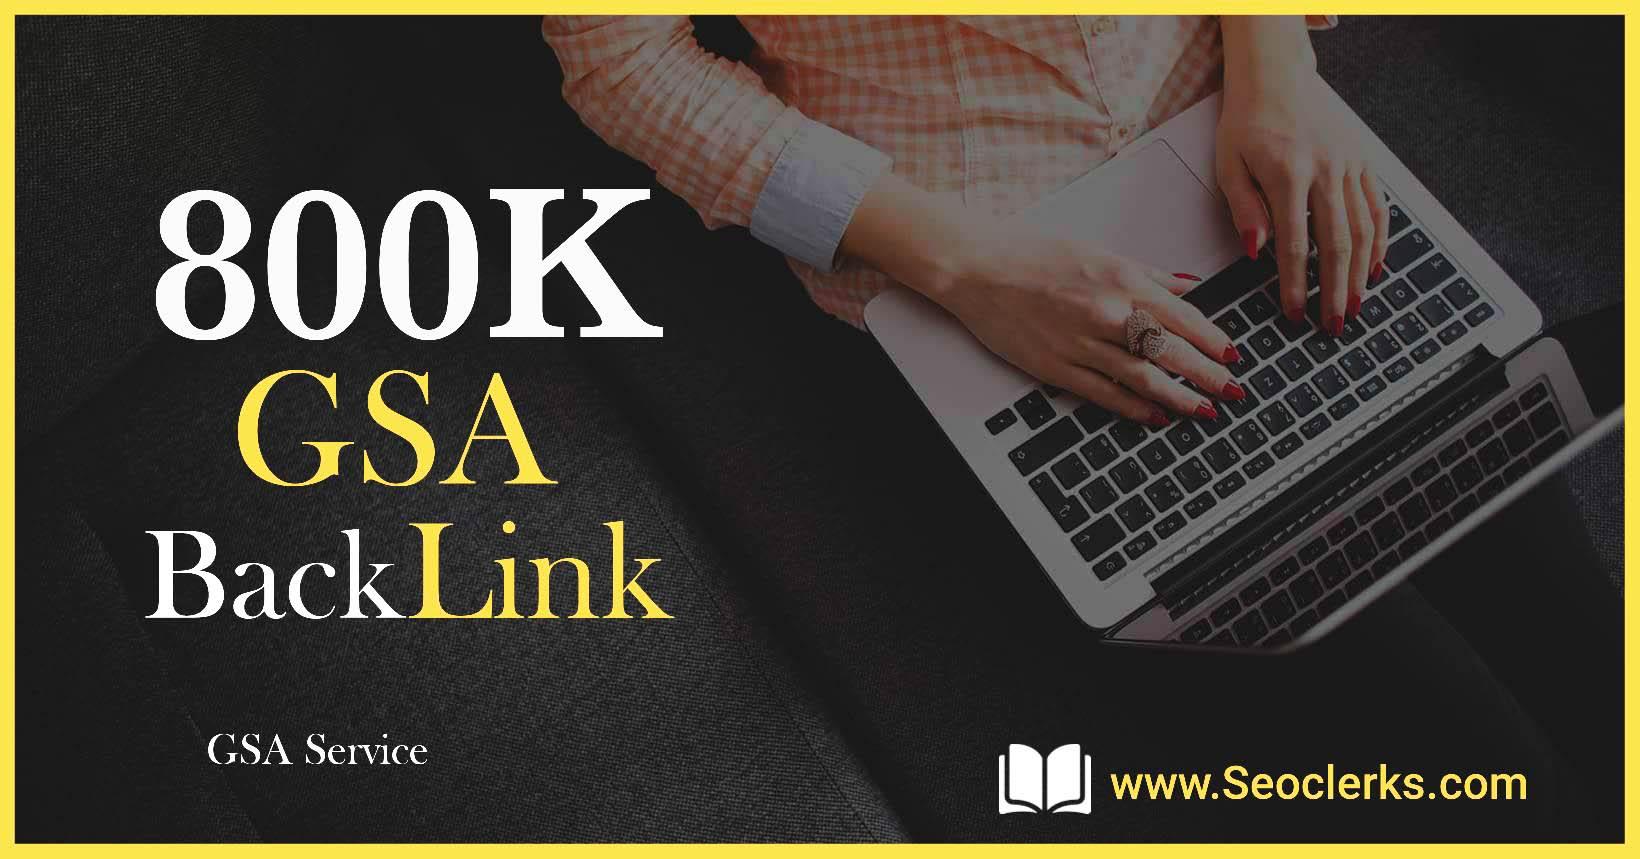 800K SEO GSA SER High Quality Backlinks for Google Ranking